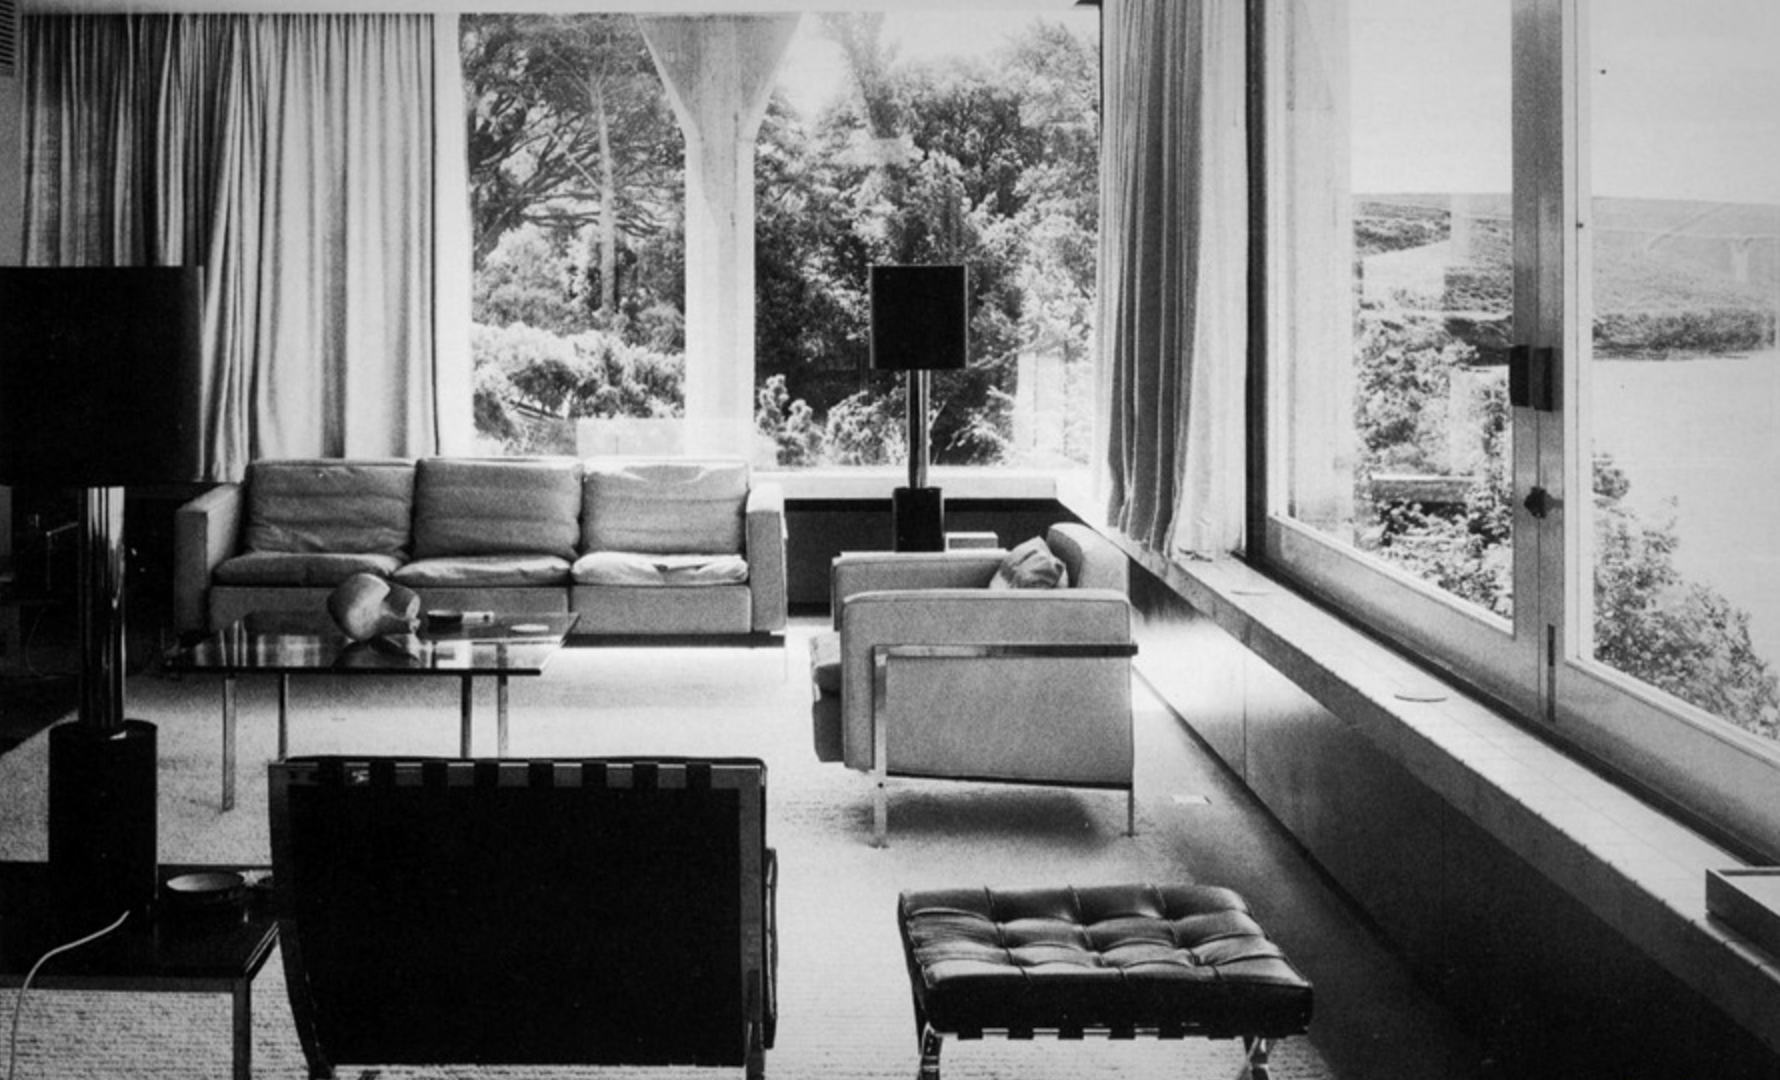 OFlaherty House, Kinsale - Robin Walker - Prime Architecture London Blog 6.png